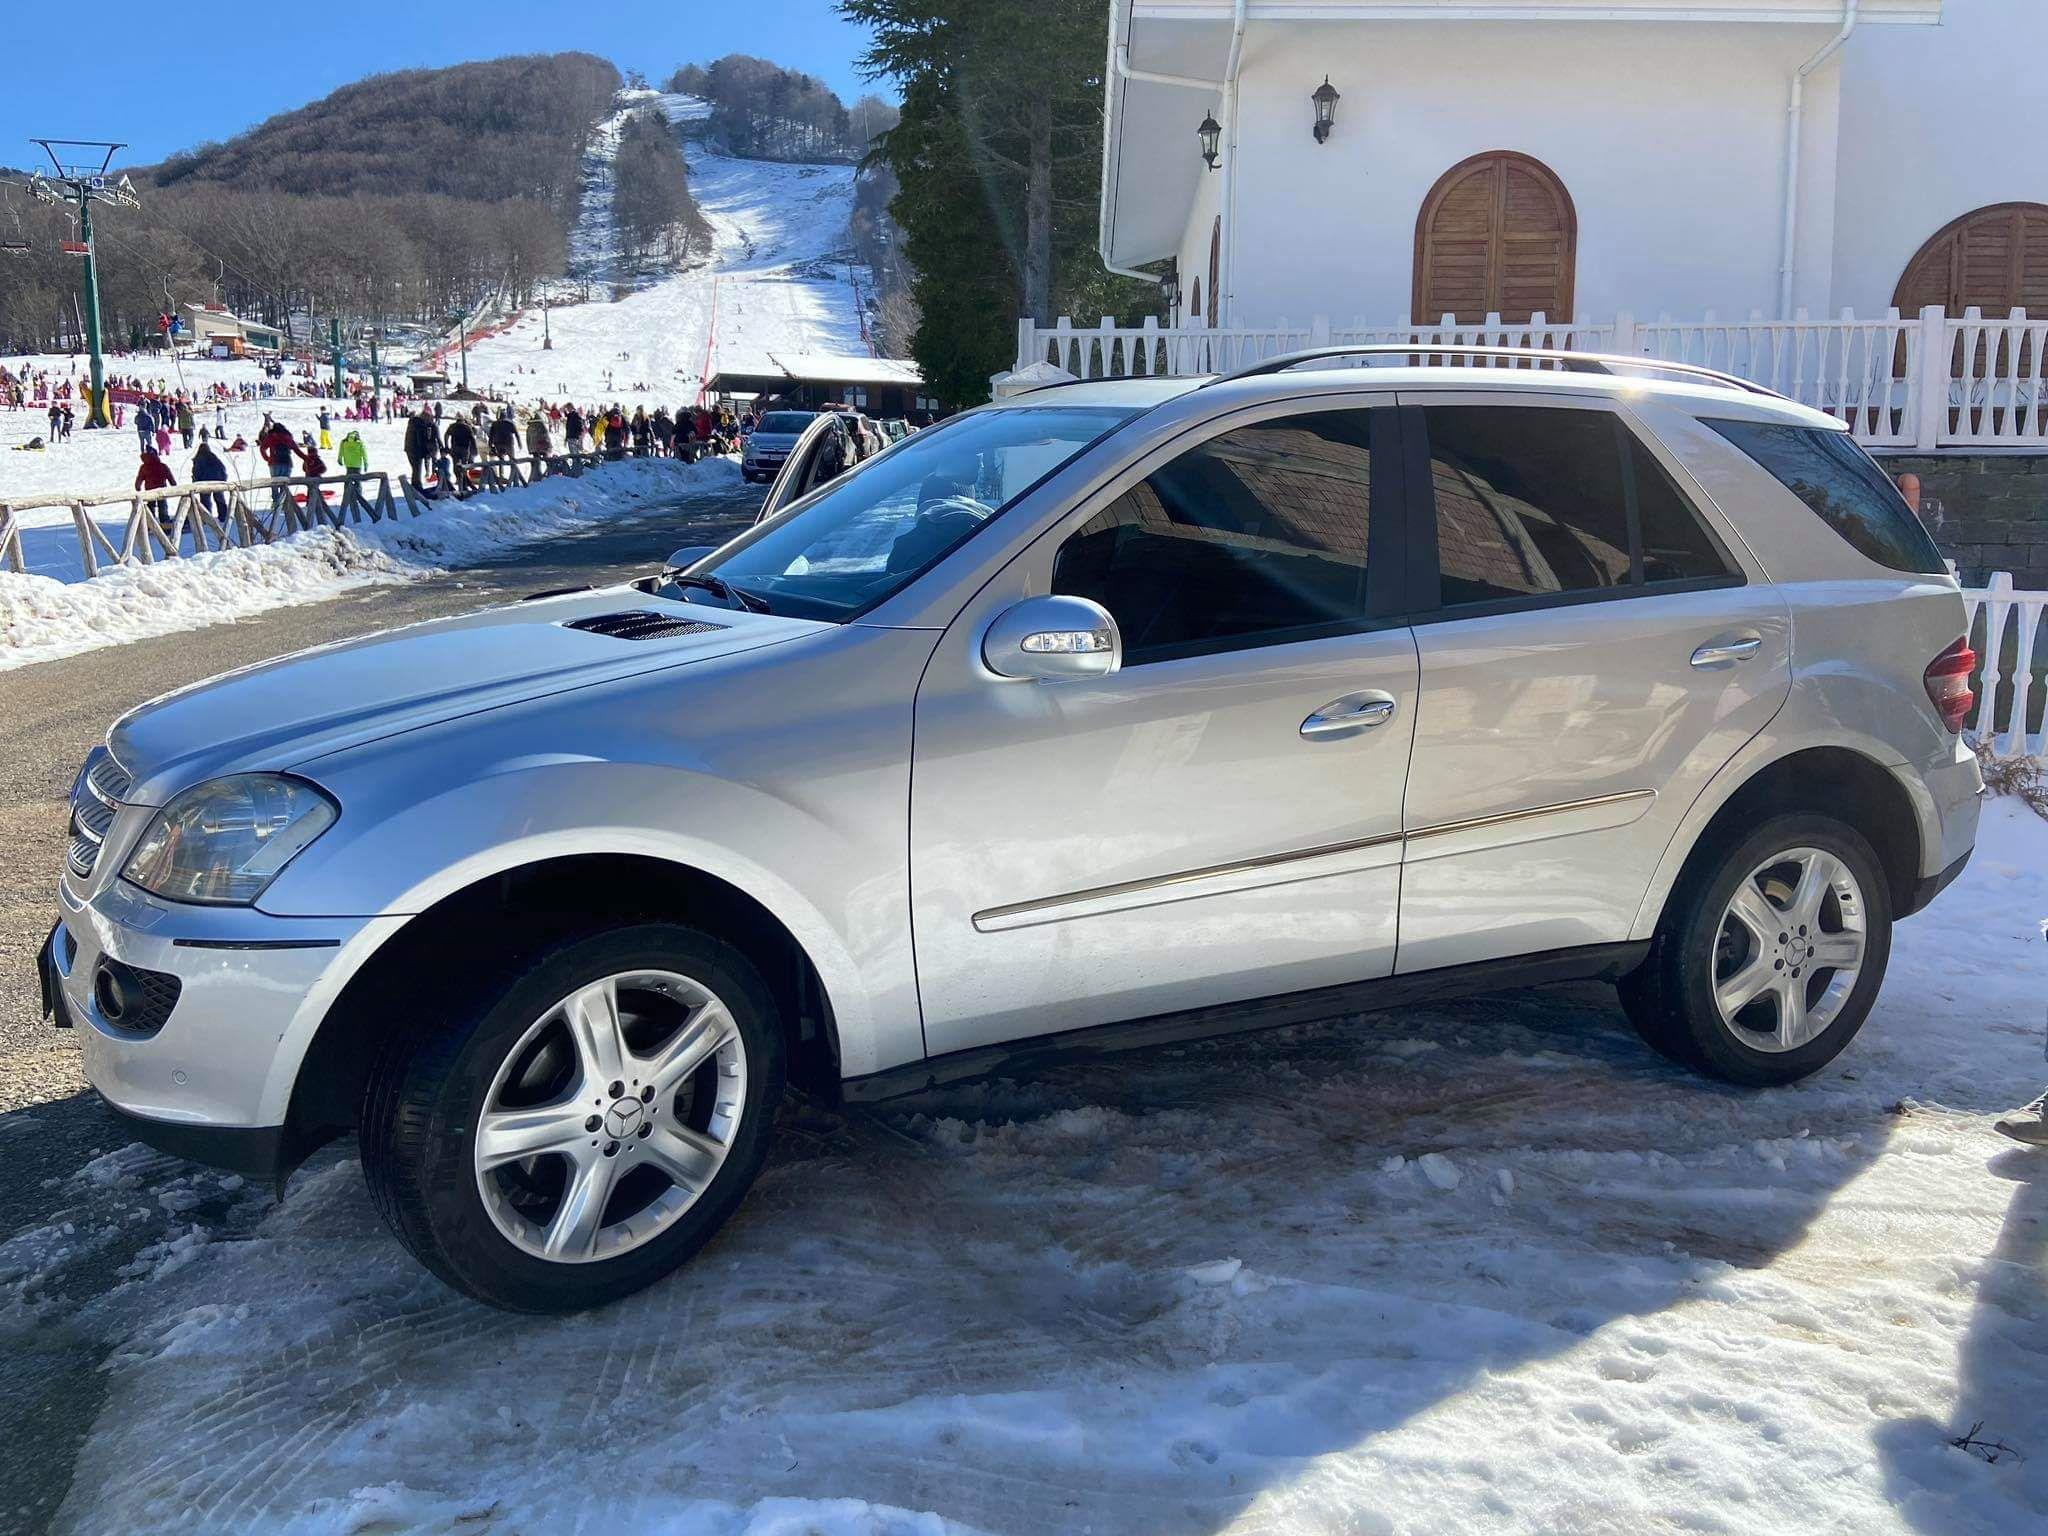 Mercedes ML 320 4 matic